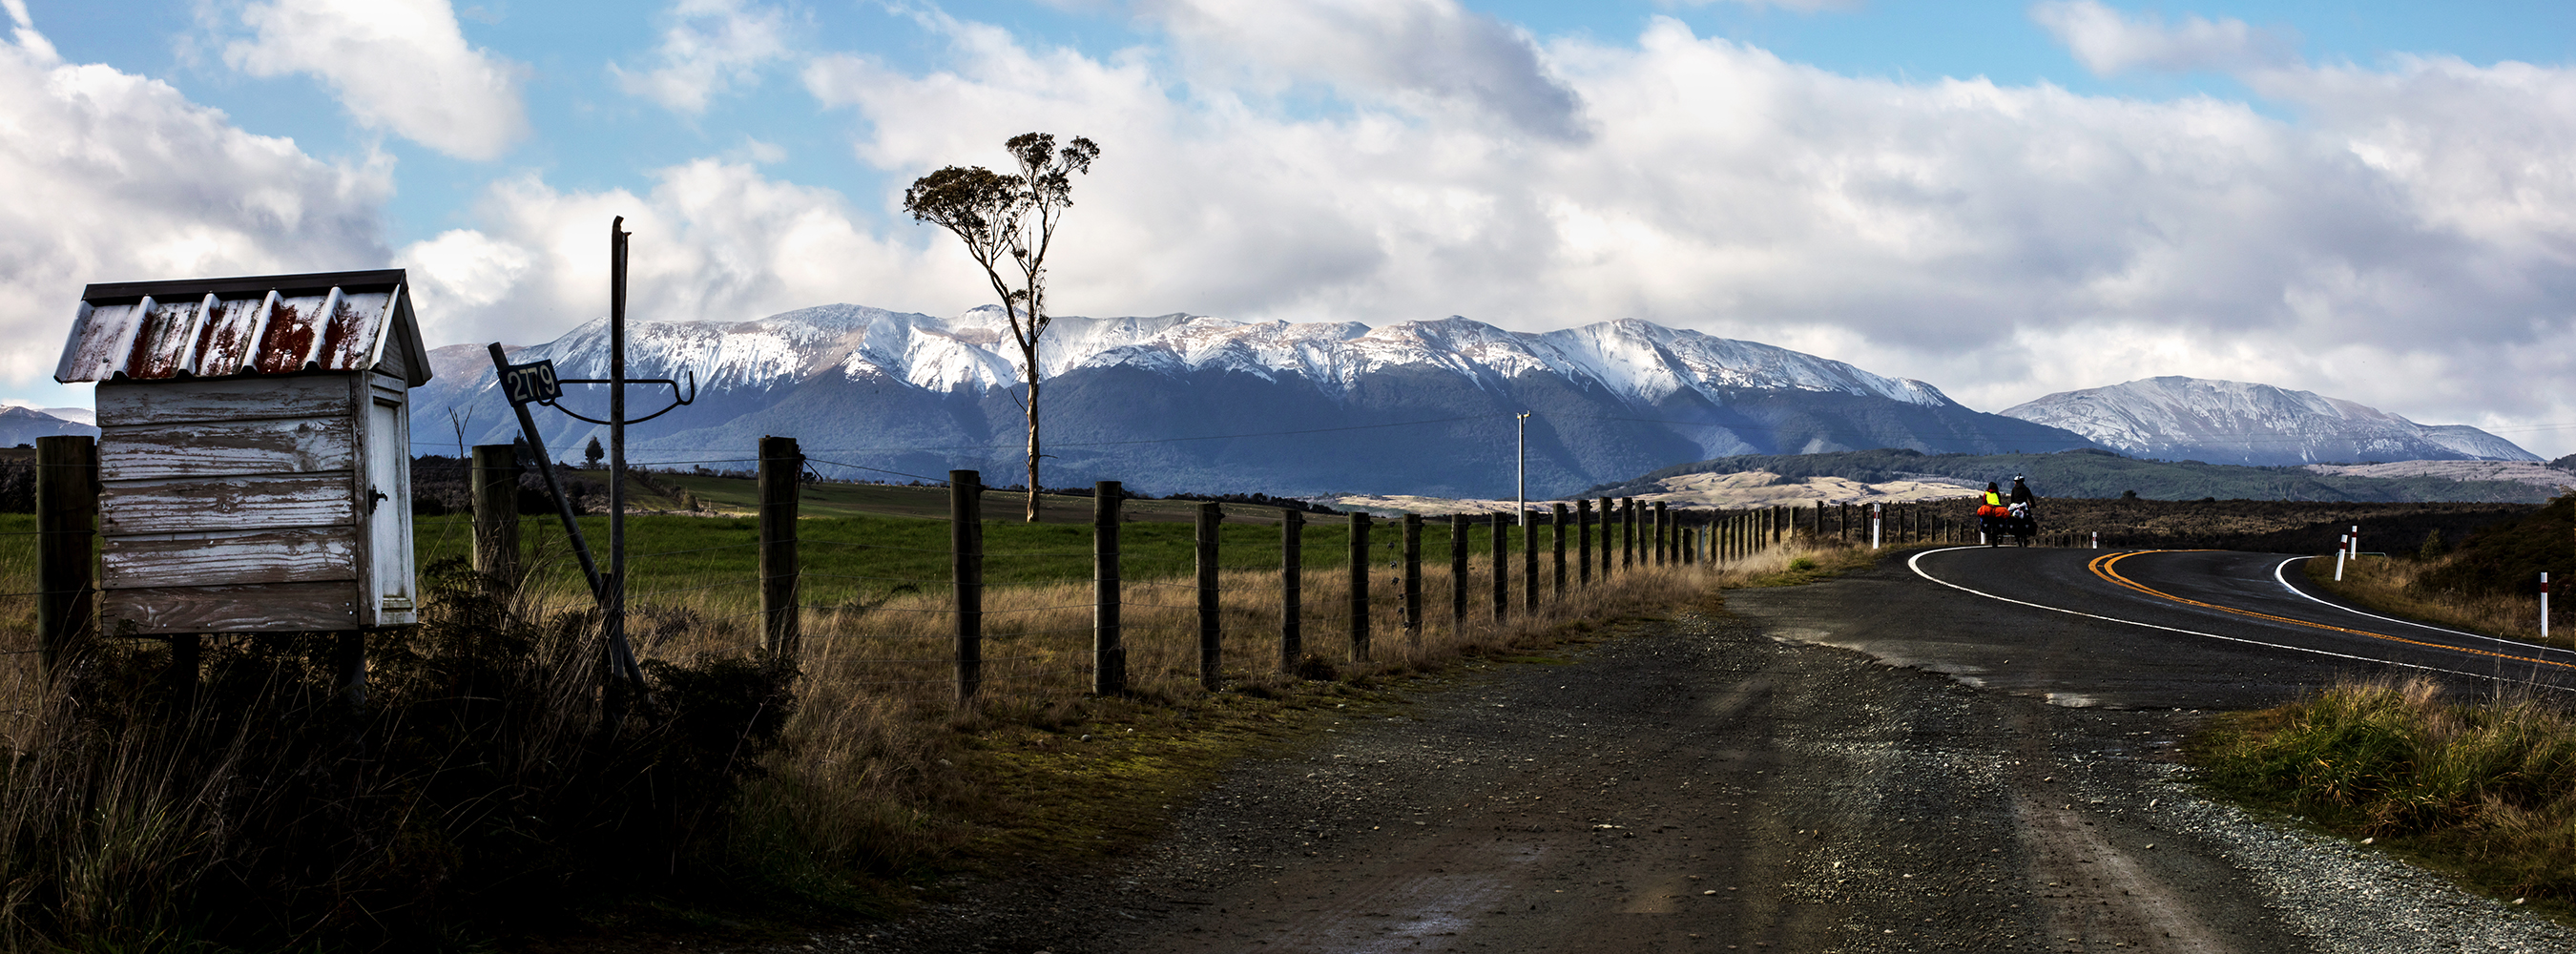 Exploring Fiordland at Te Anau Downs